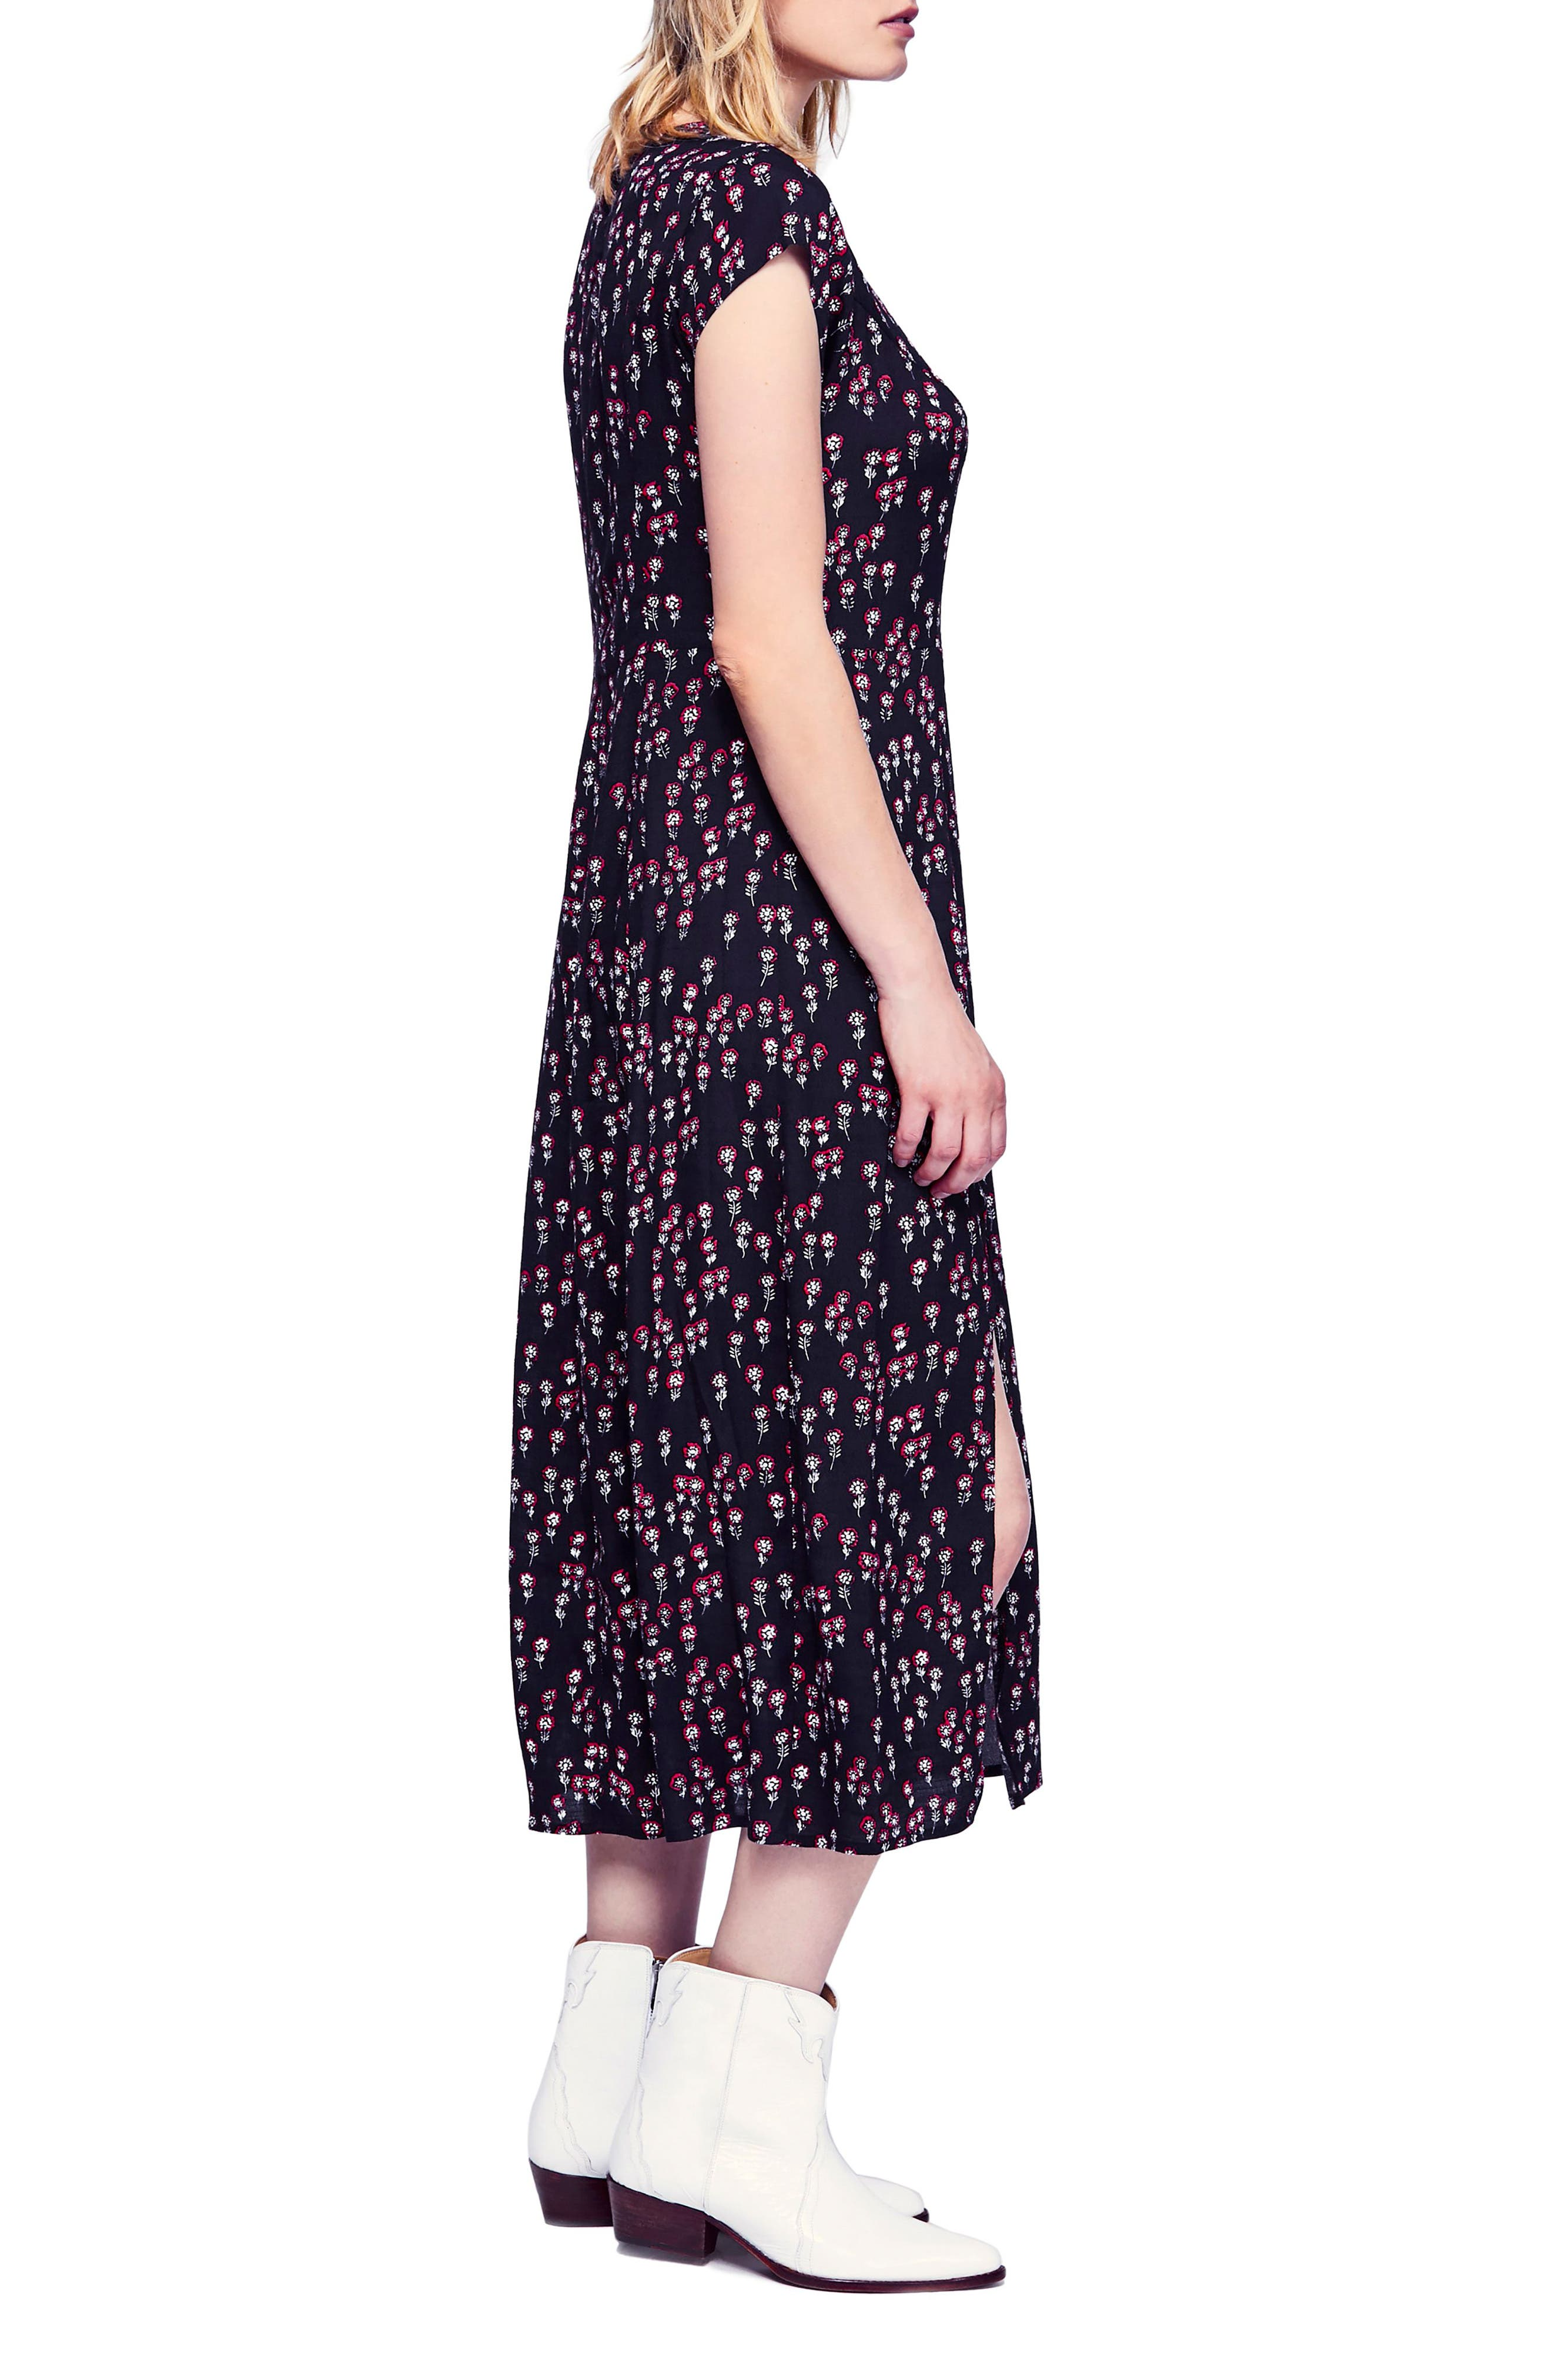 FREE PEOPLE,                             Corrie Midi Dress,                             Alternate thumbnail 3, color,                             BLACK